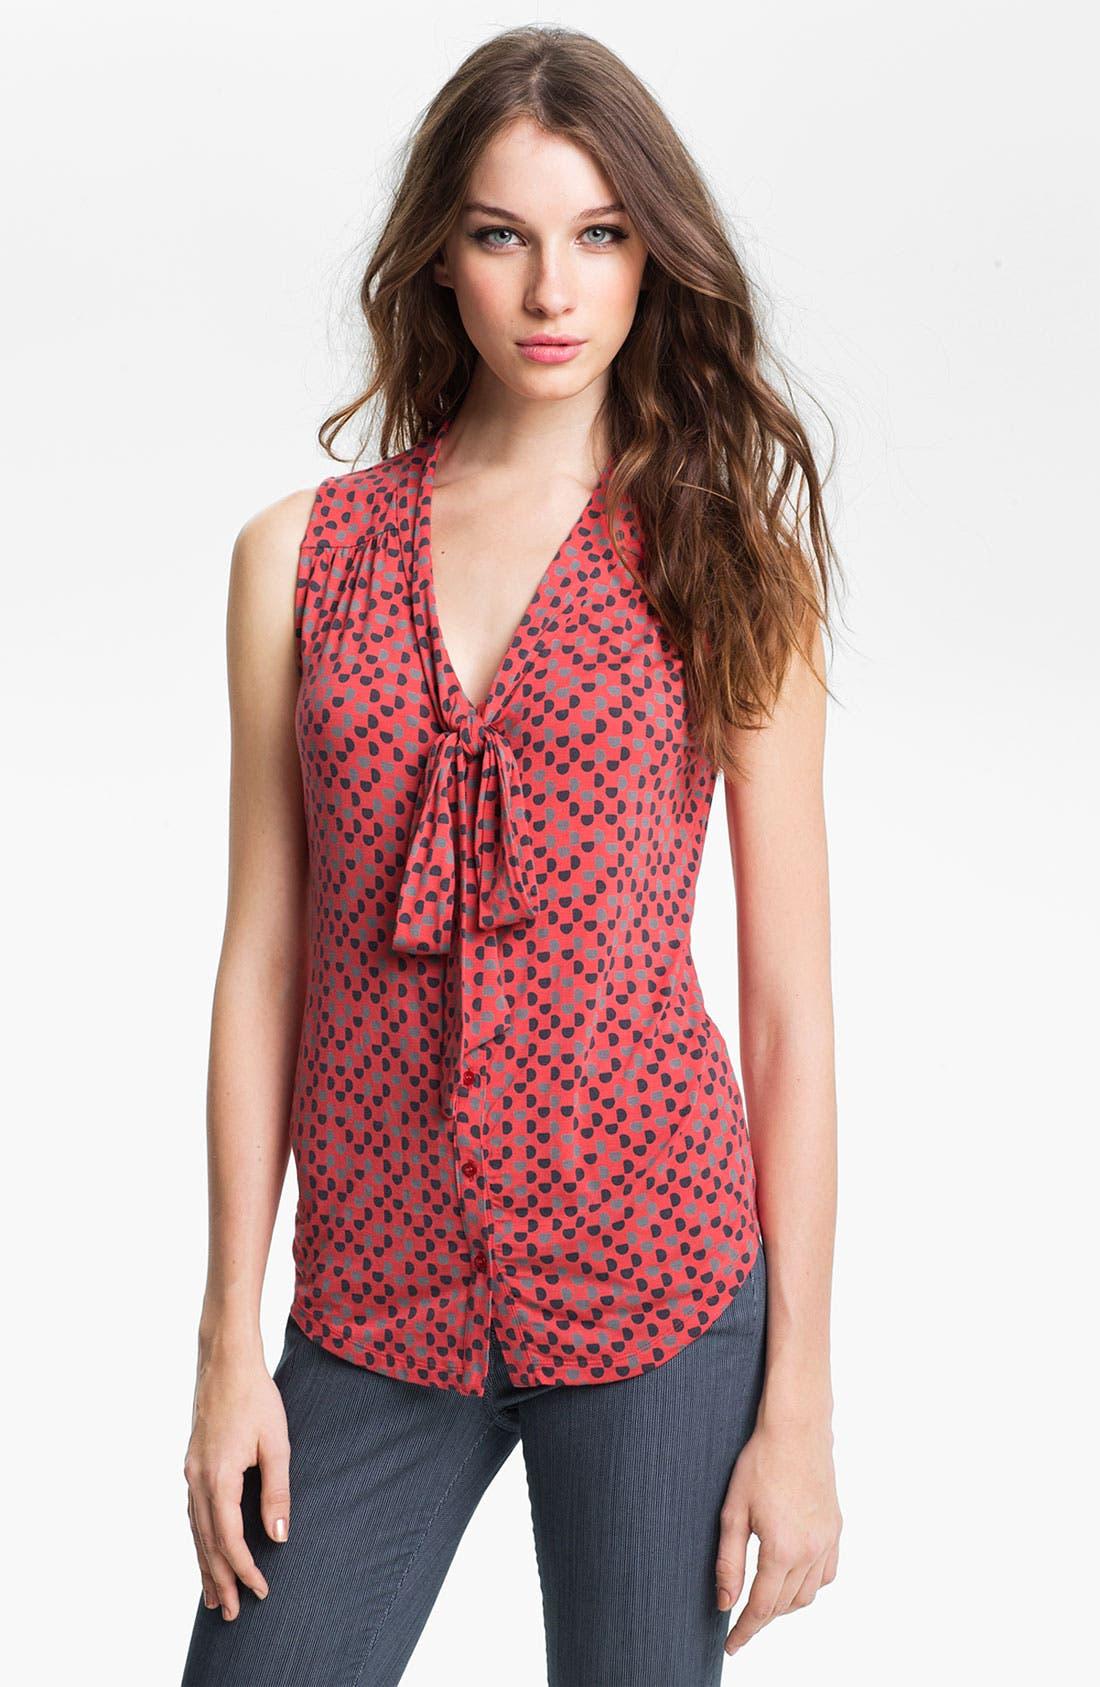 Alternate Image 1 Selected - Halogen Tie Neck Sleeveless Knit Top (Petite)